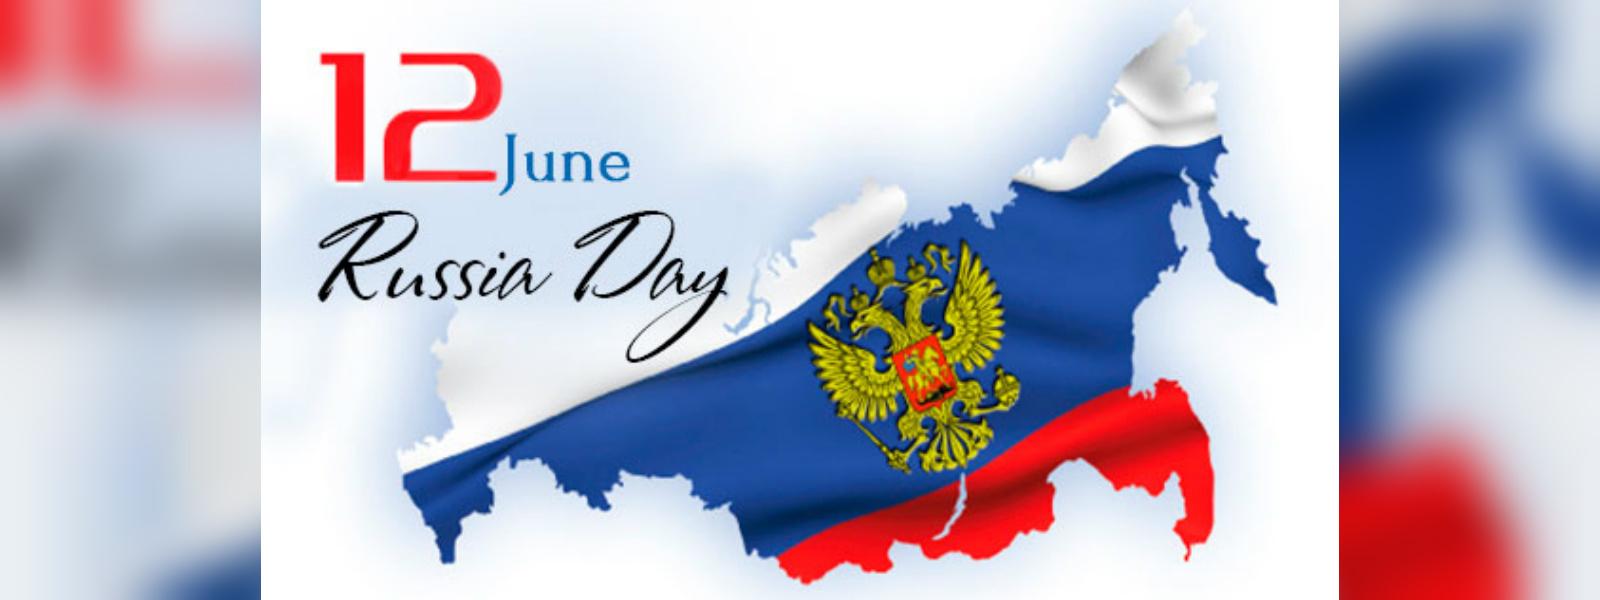 Russia Day celebrated in Sri Lanka